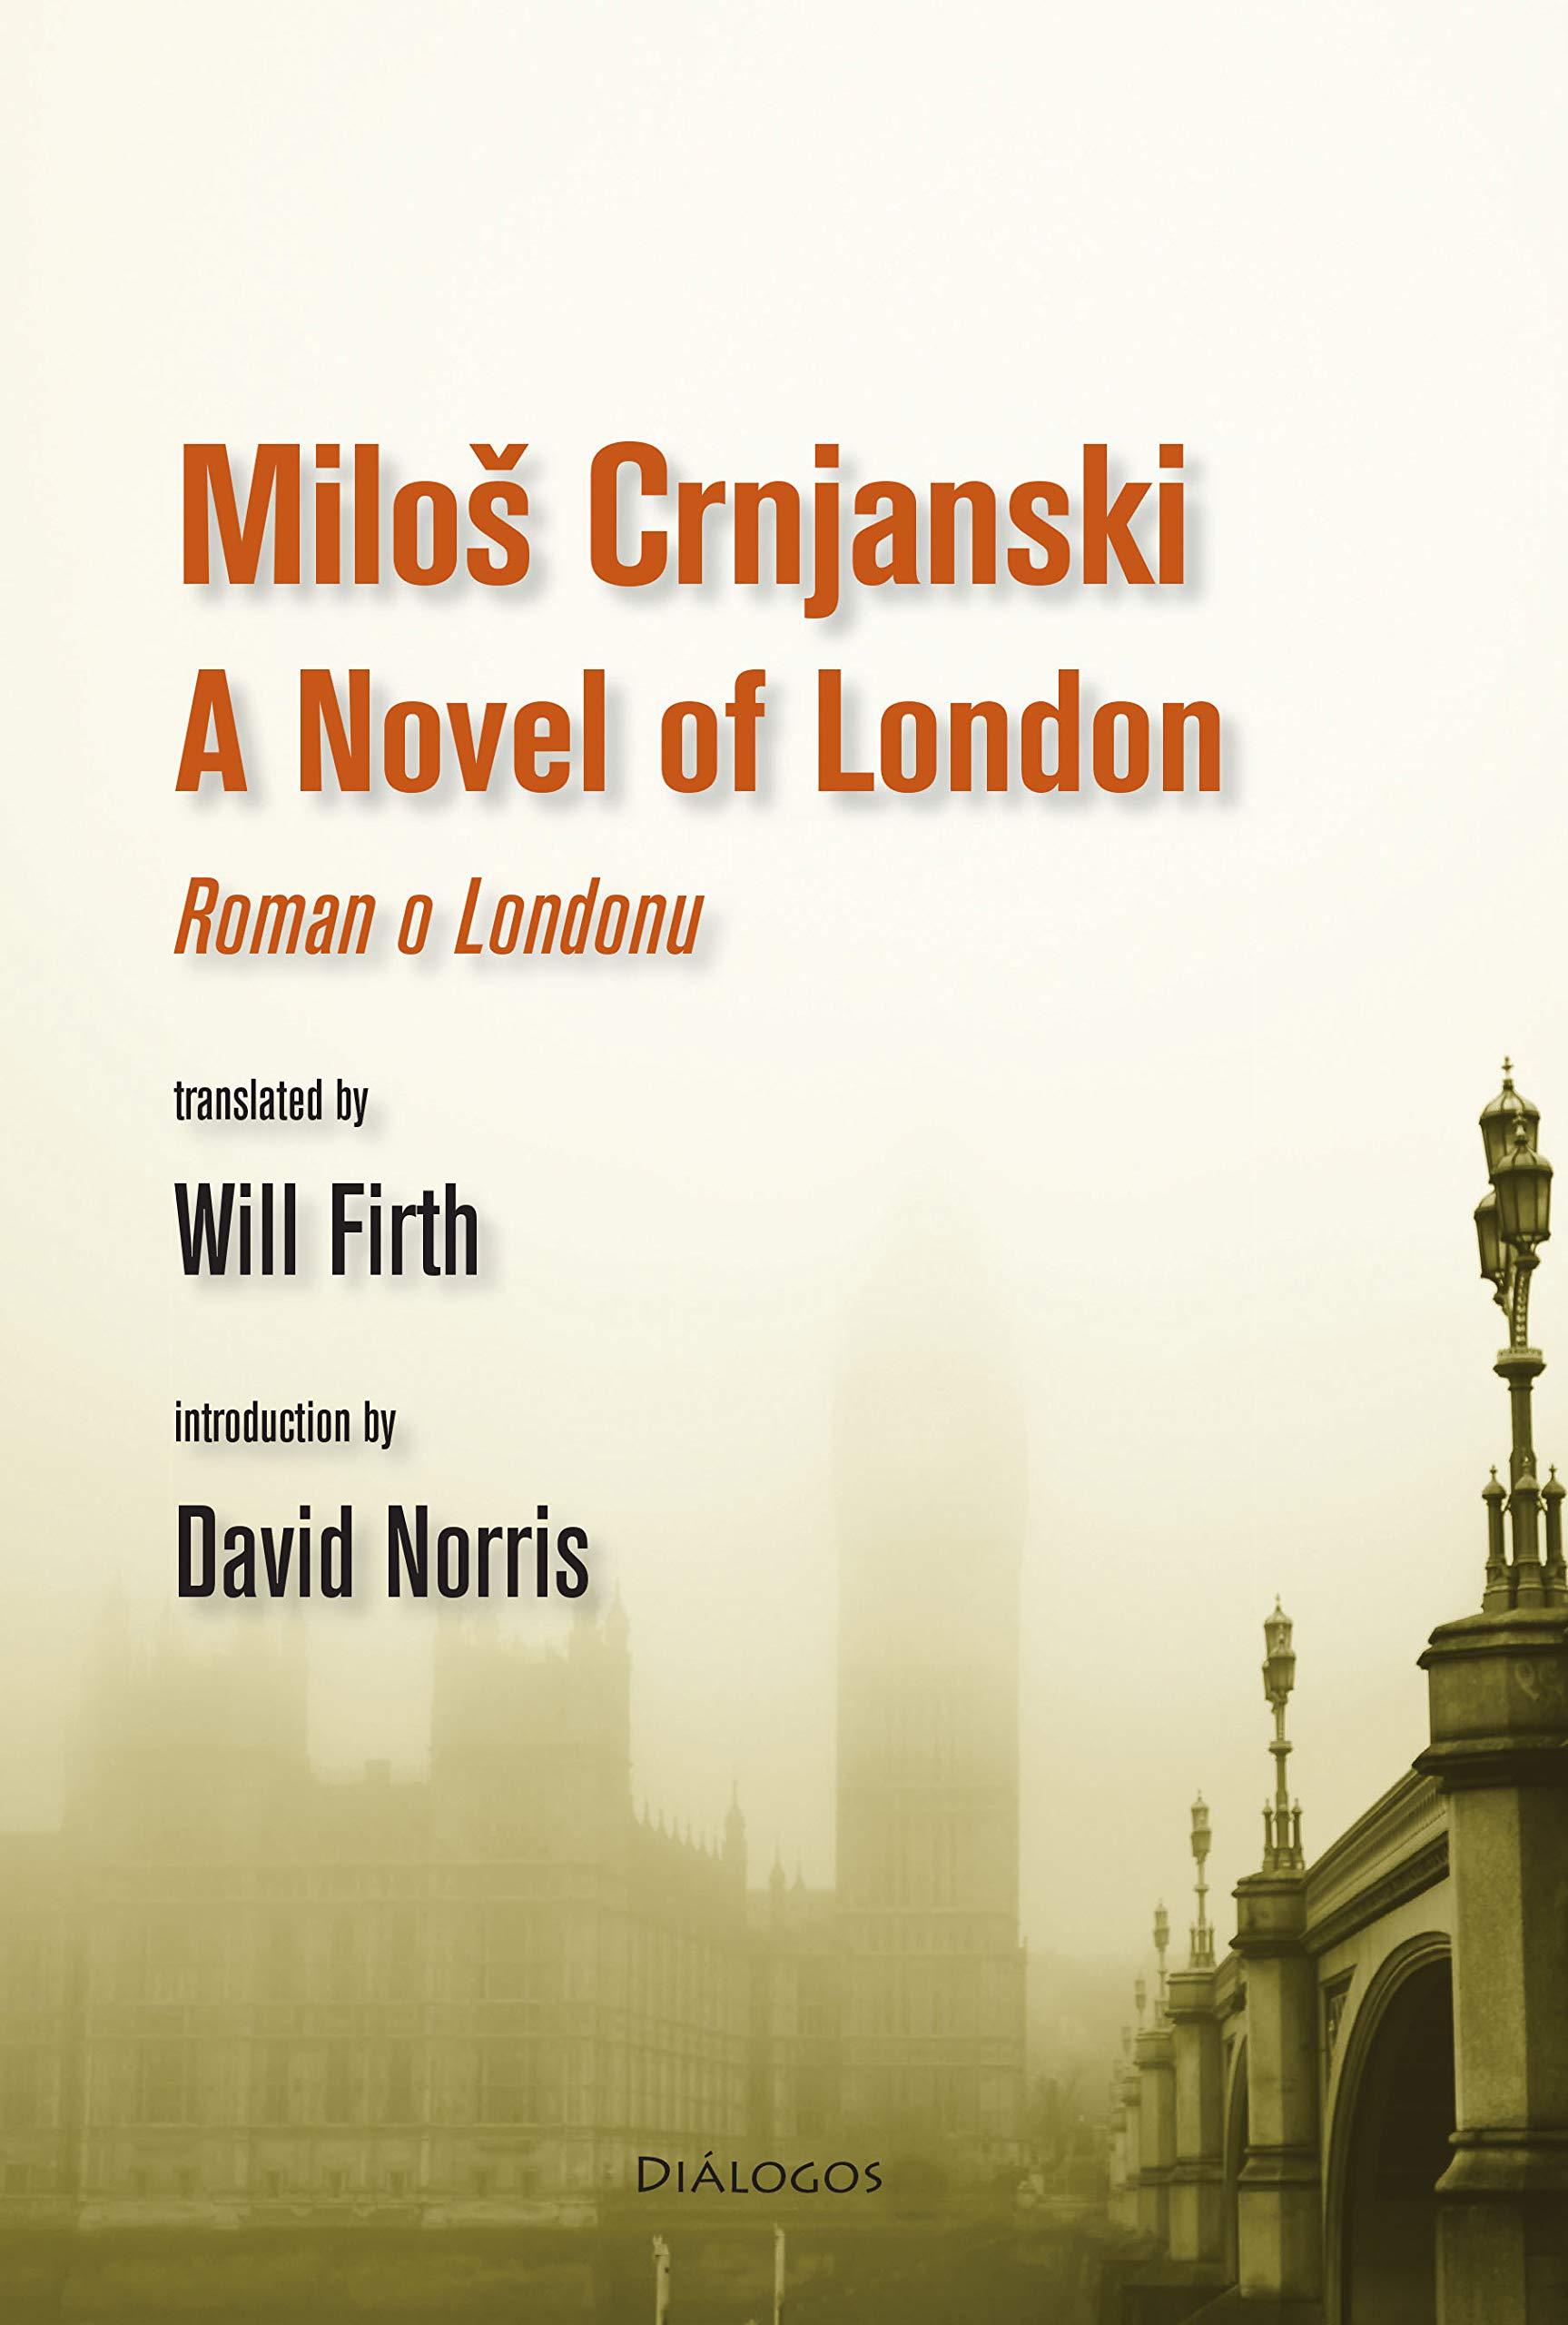 Amazon.com: A Novel of London (9781944884666): Crnjanski, Milos, Firth,  Will: Books